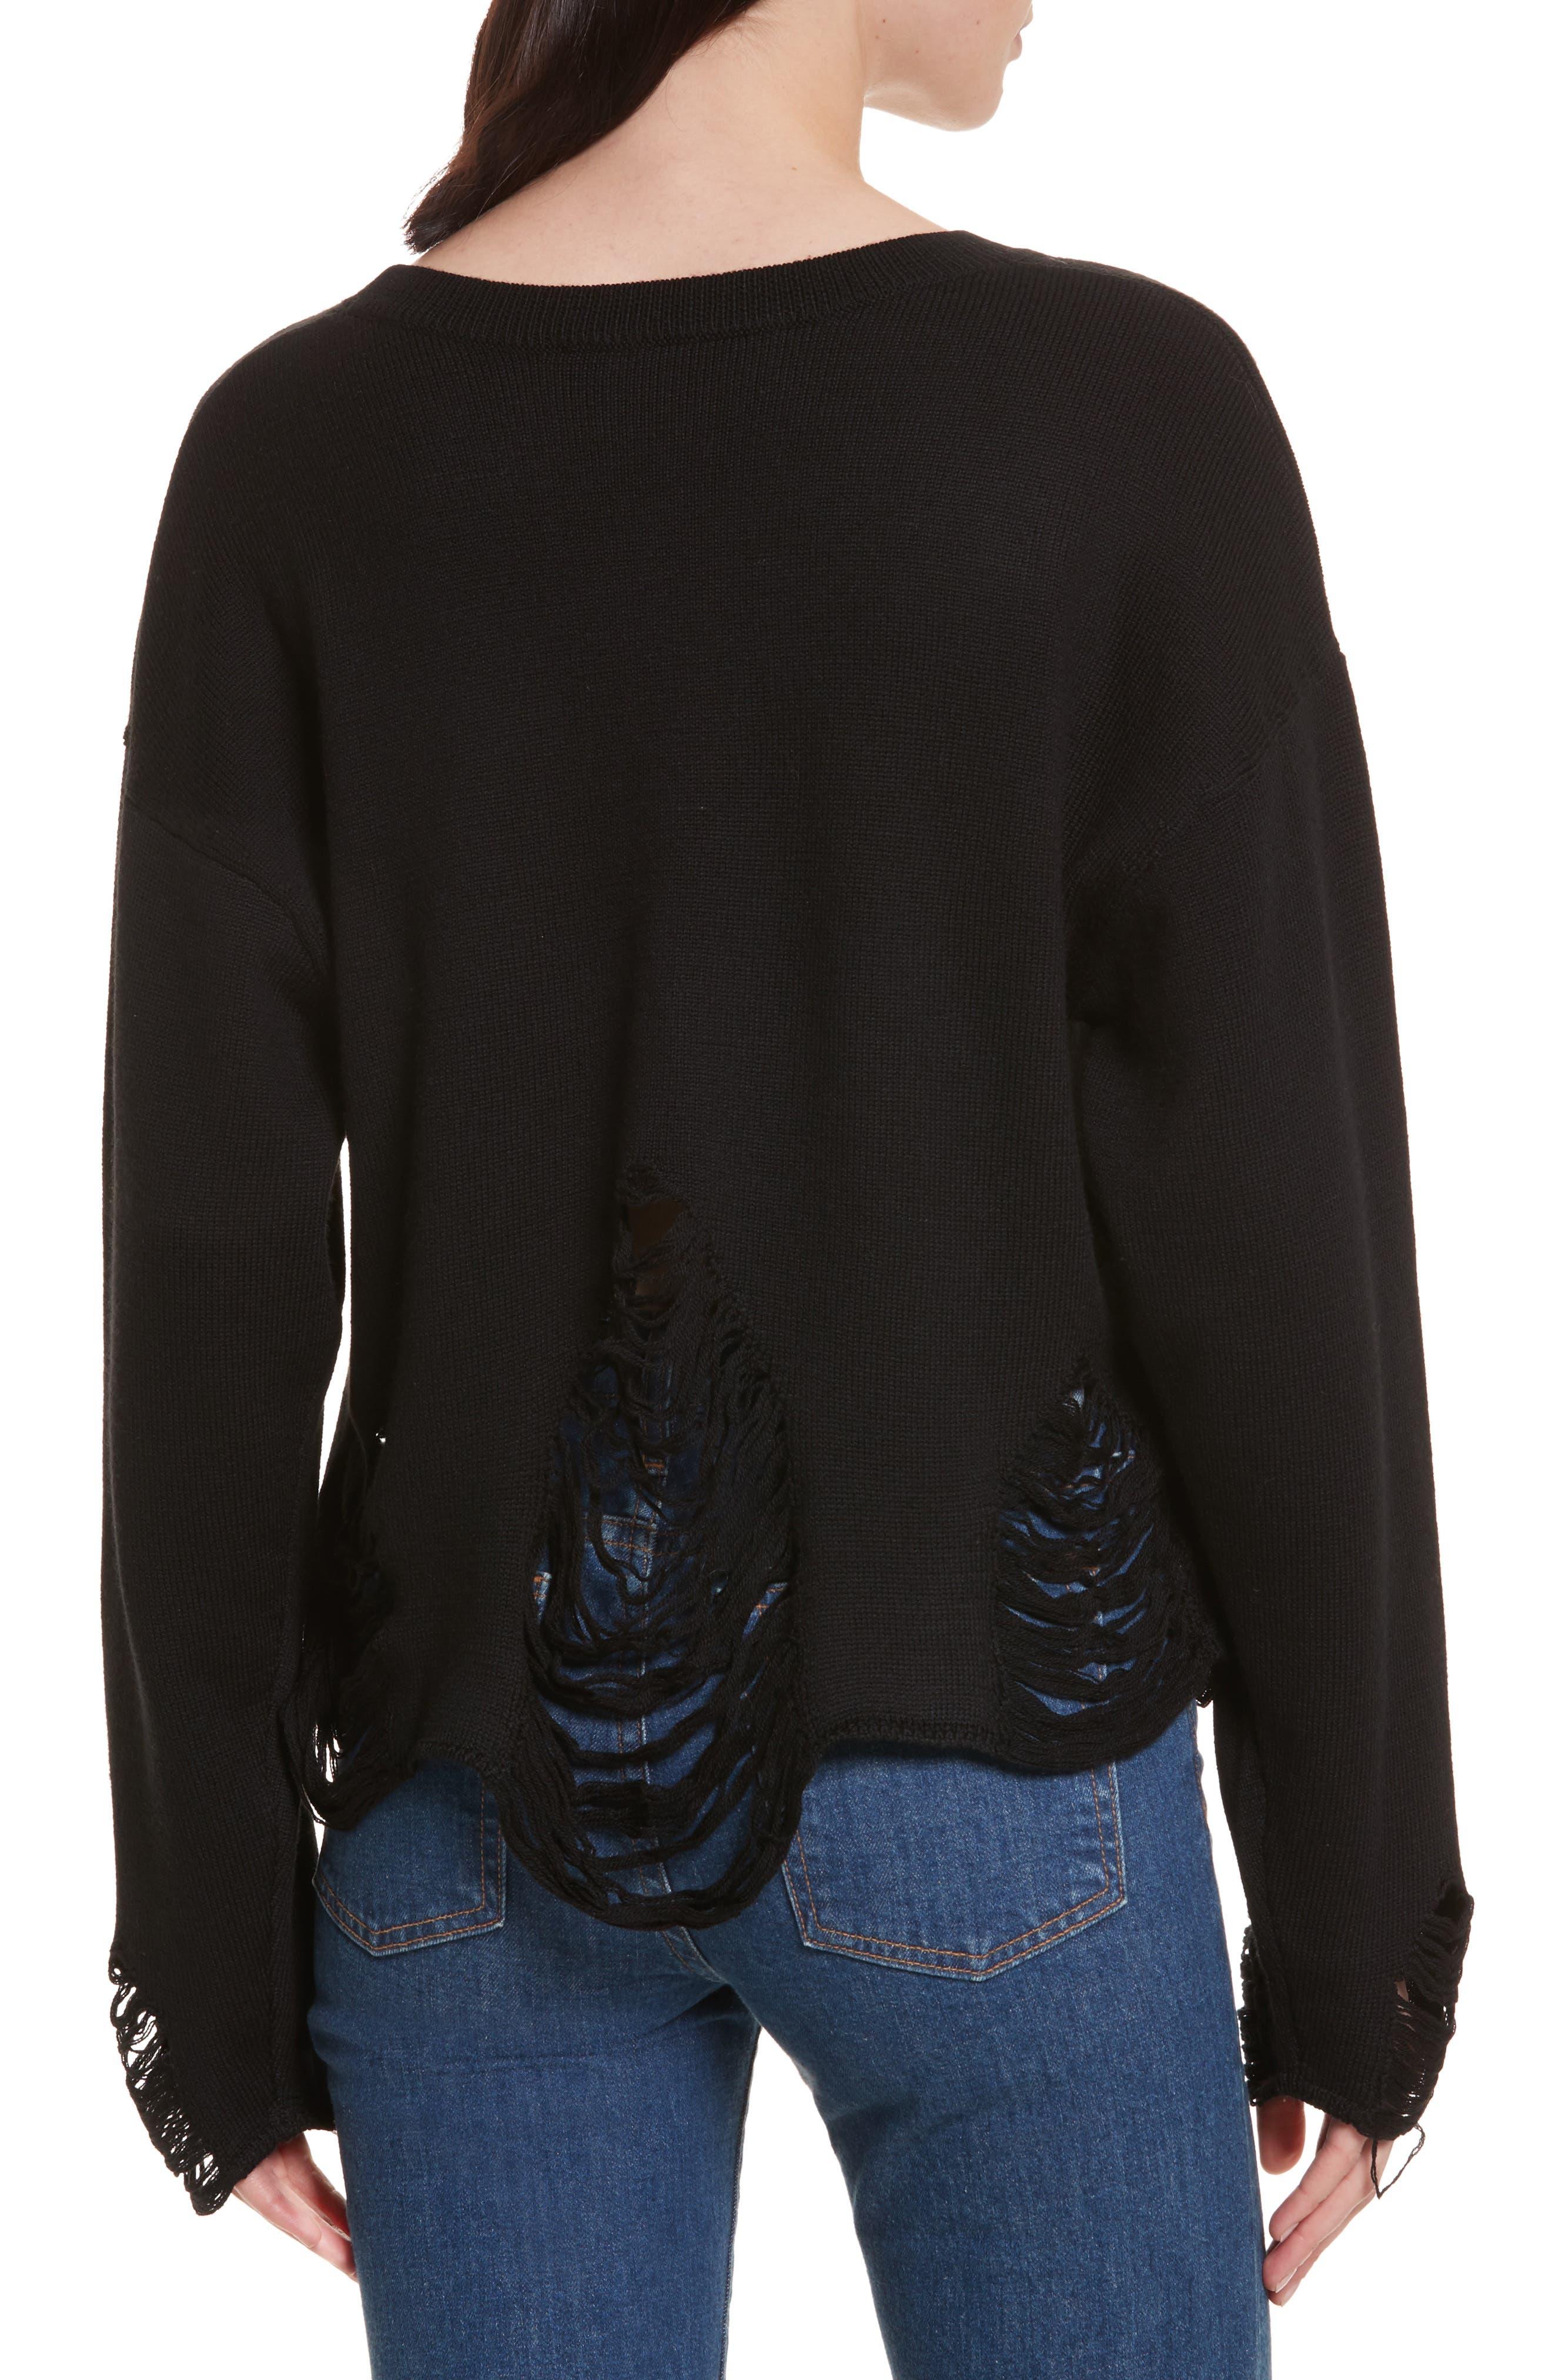 Parola Sweater,                             Alternate thumbnail 2, color,                             001